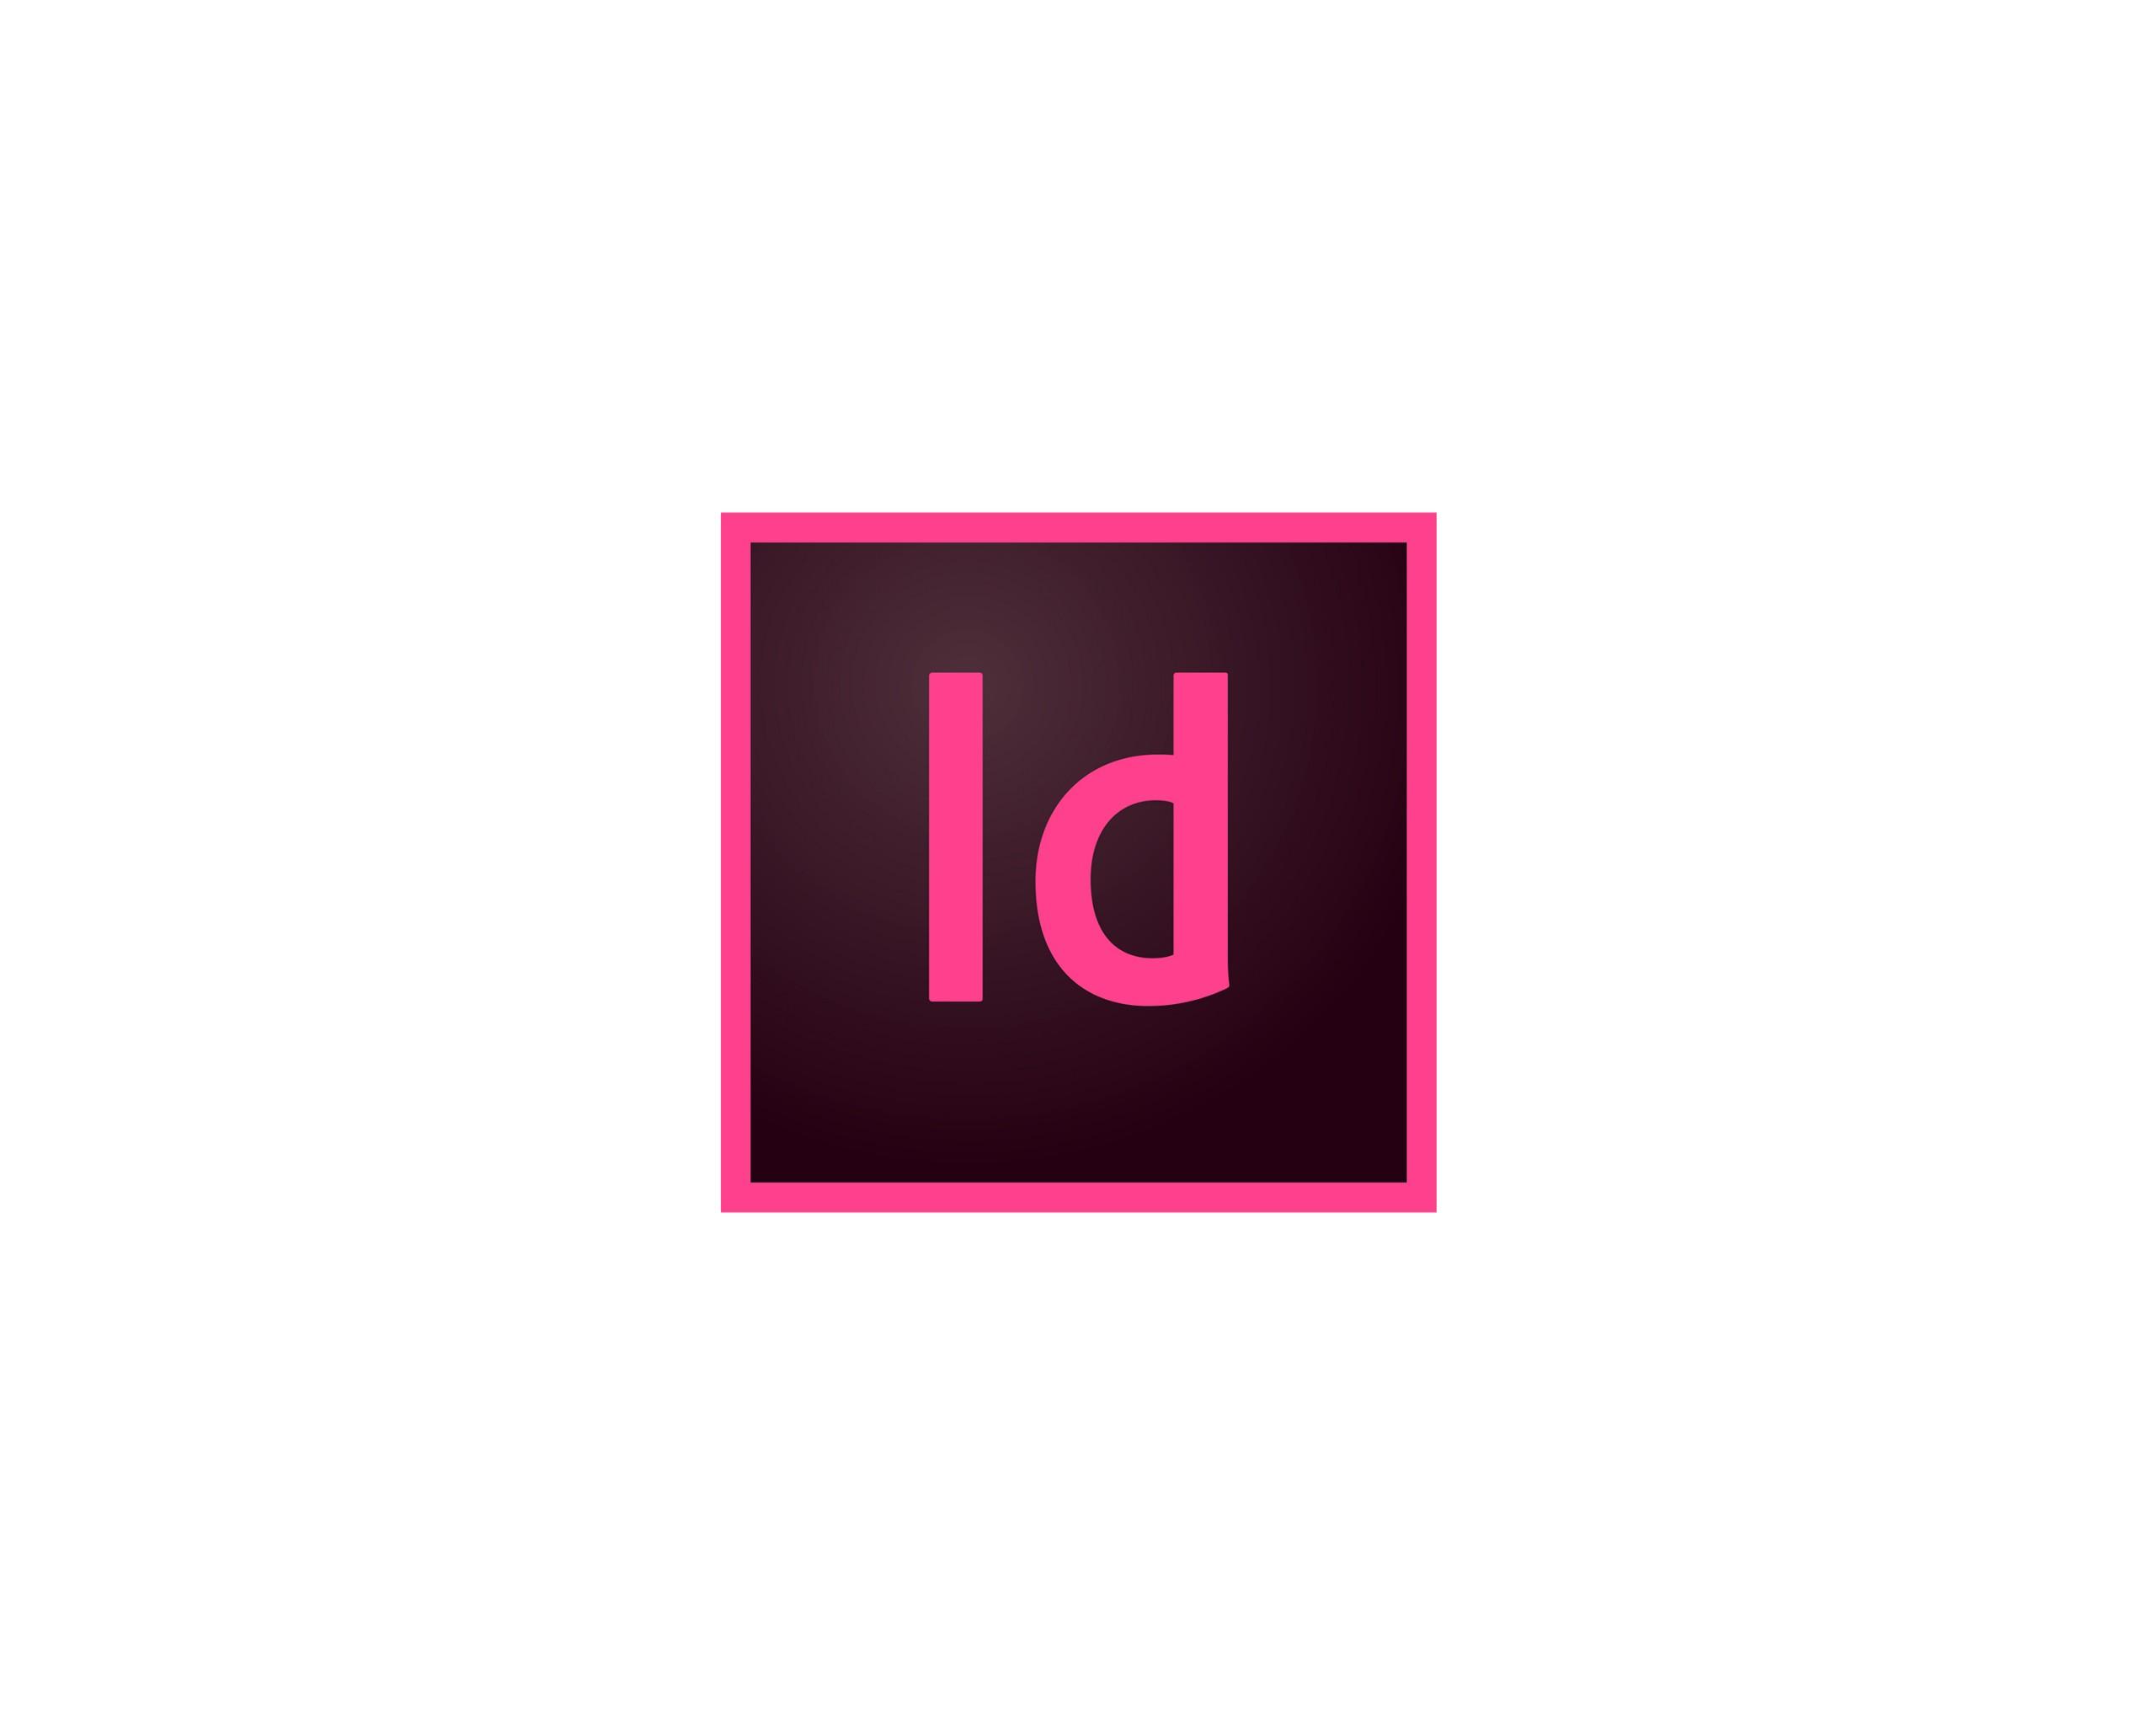 Adobe InDesign – DiSCO – Digital Scholarship Center